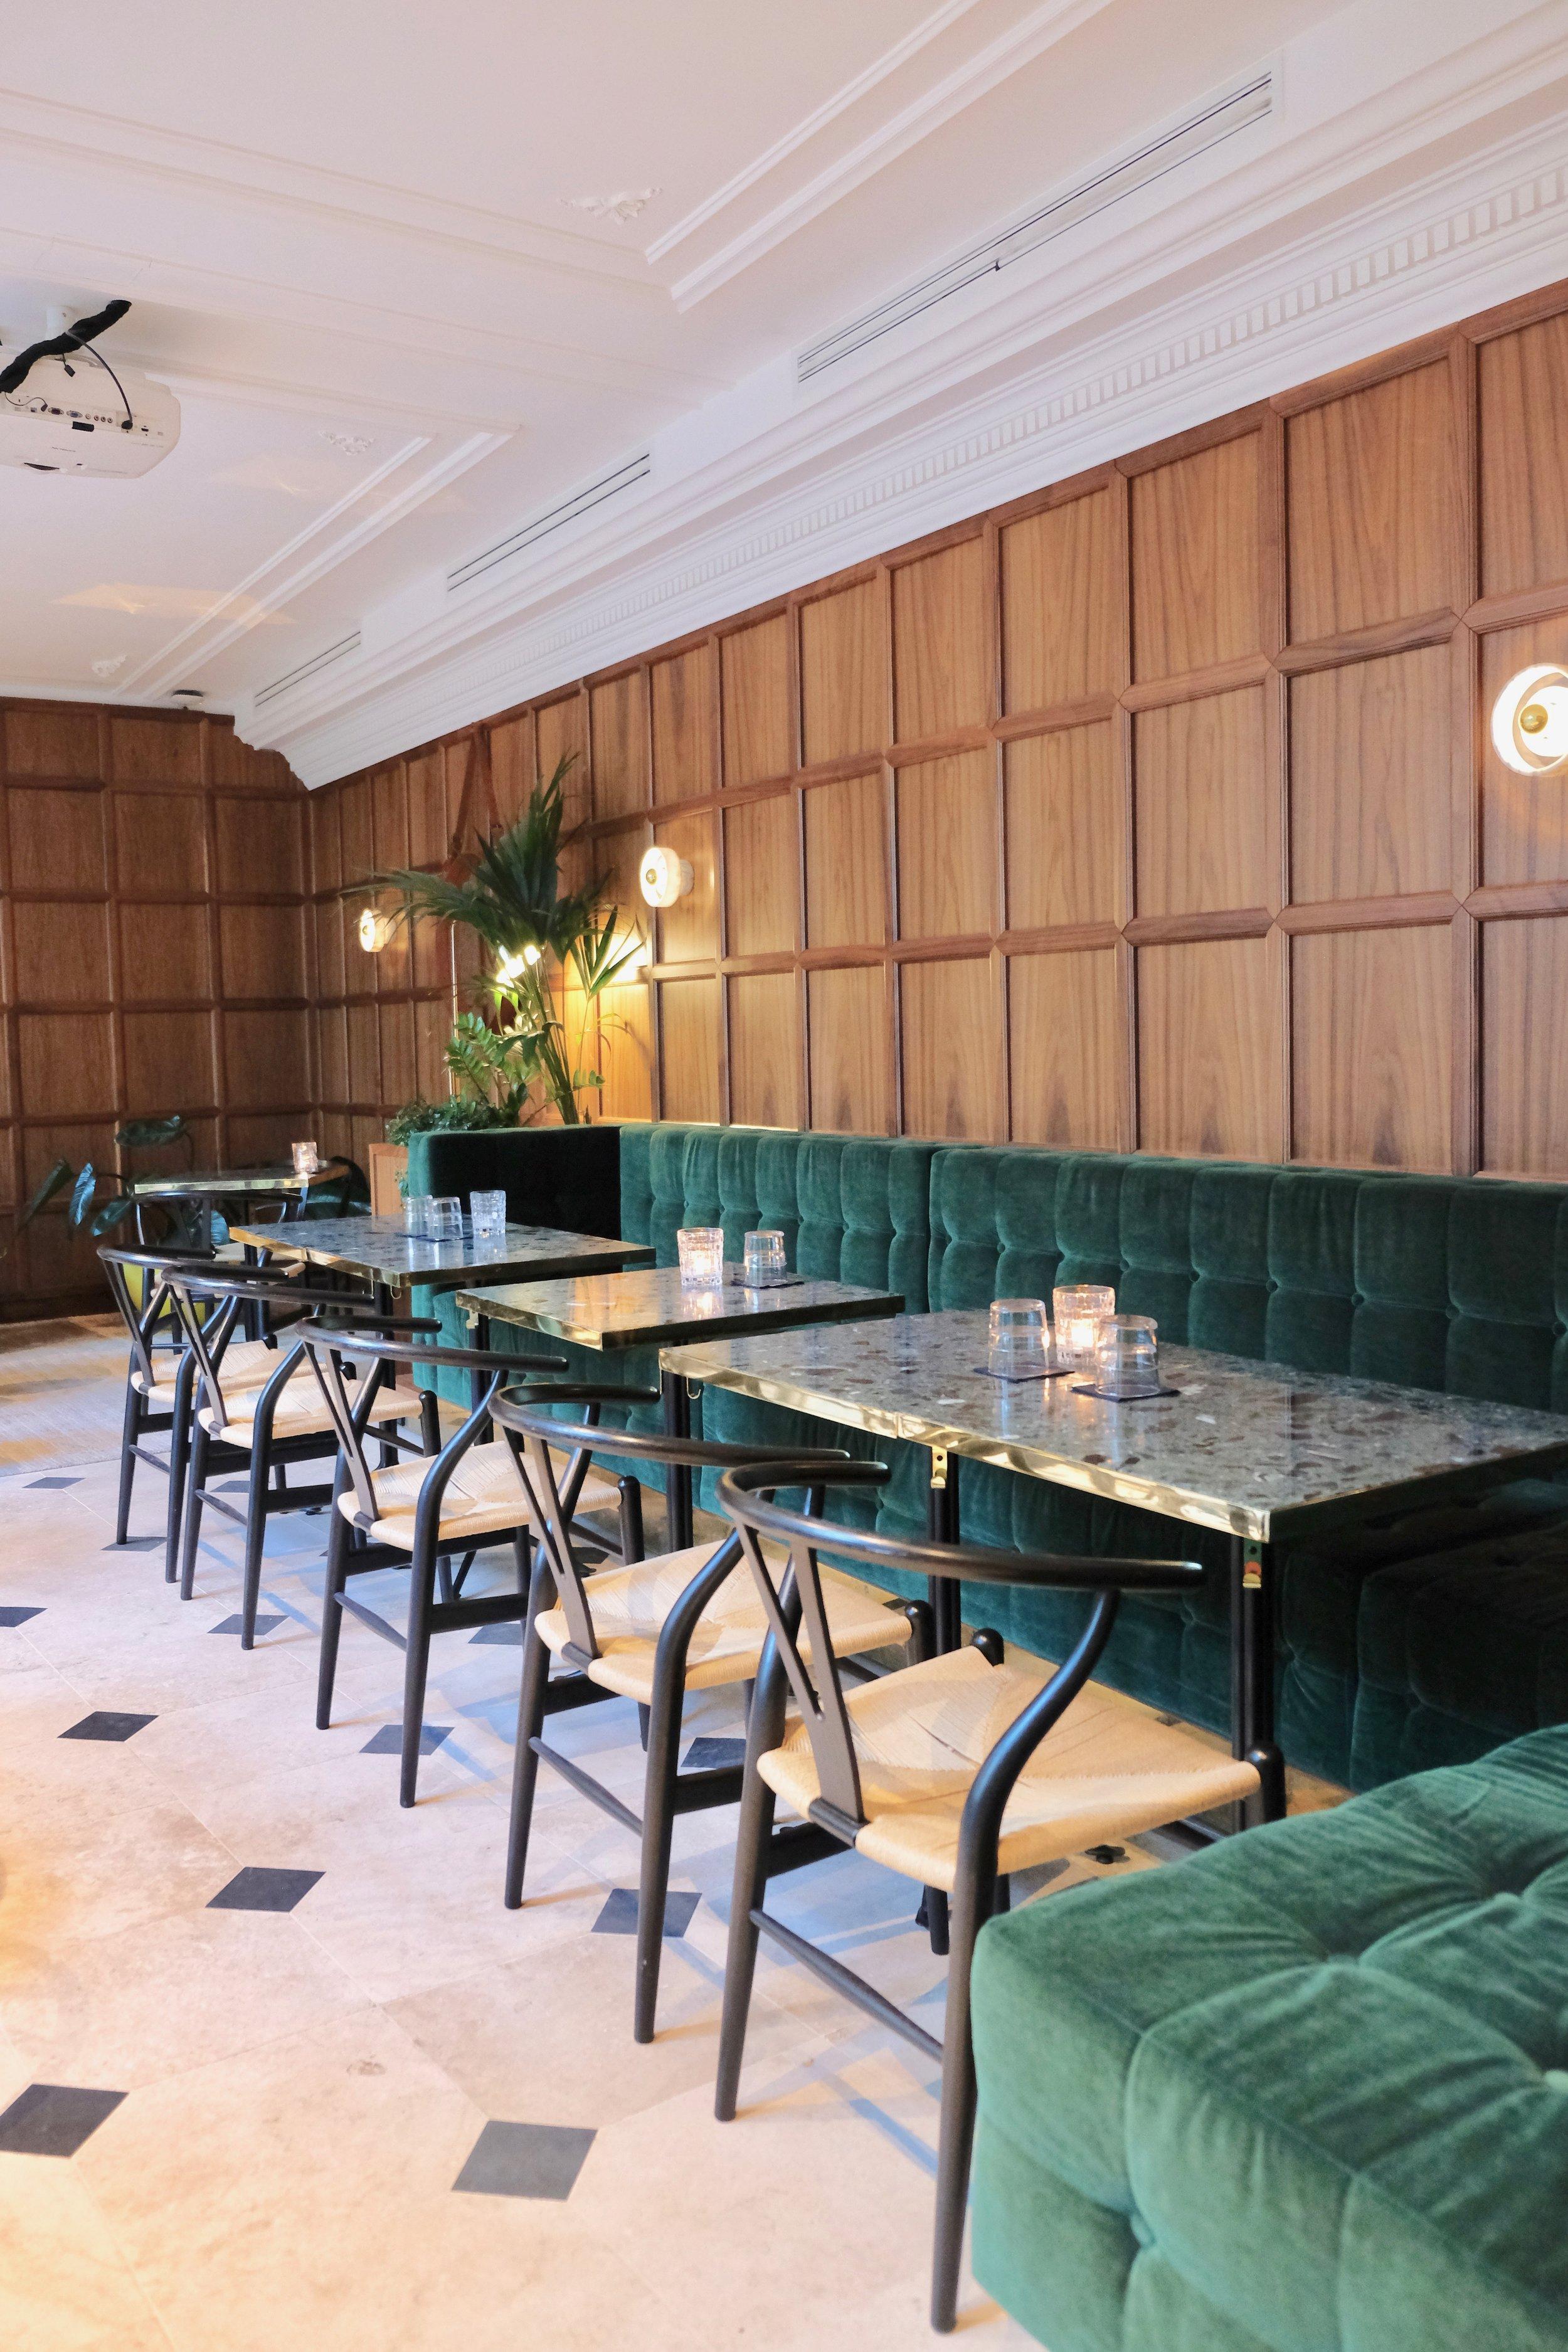 Beautiful design throughout the restaurant/bar area